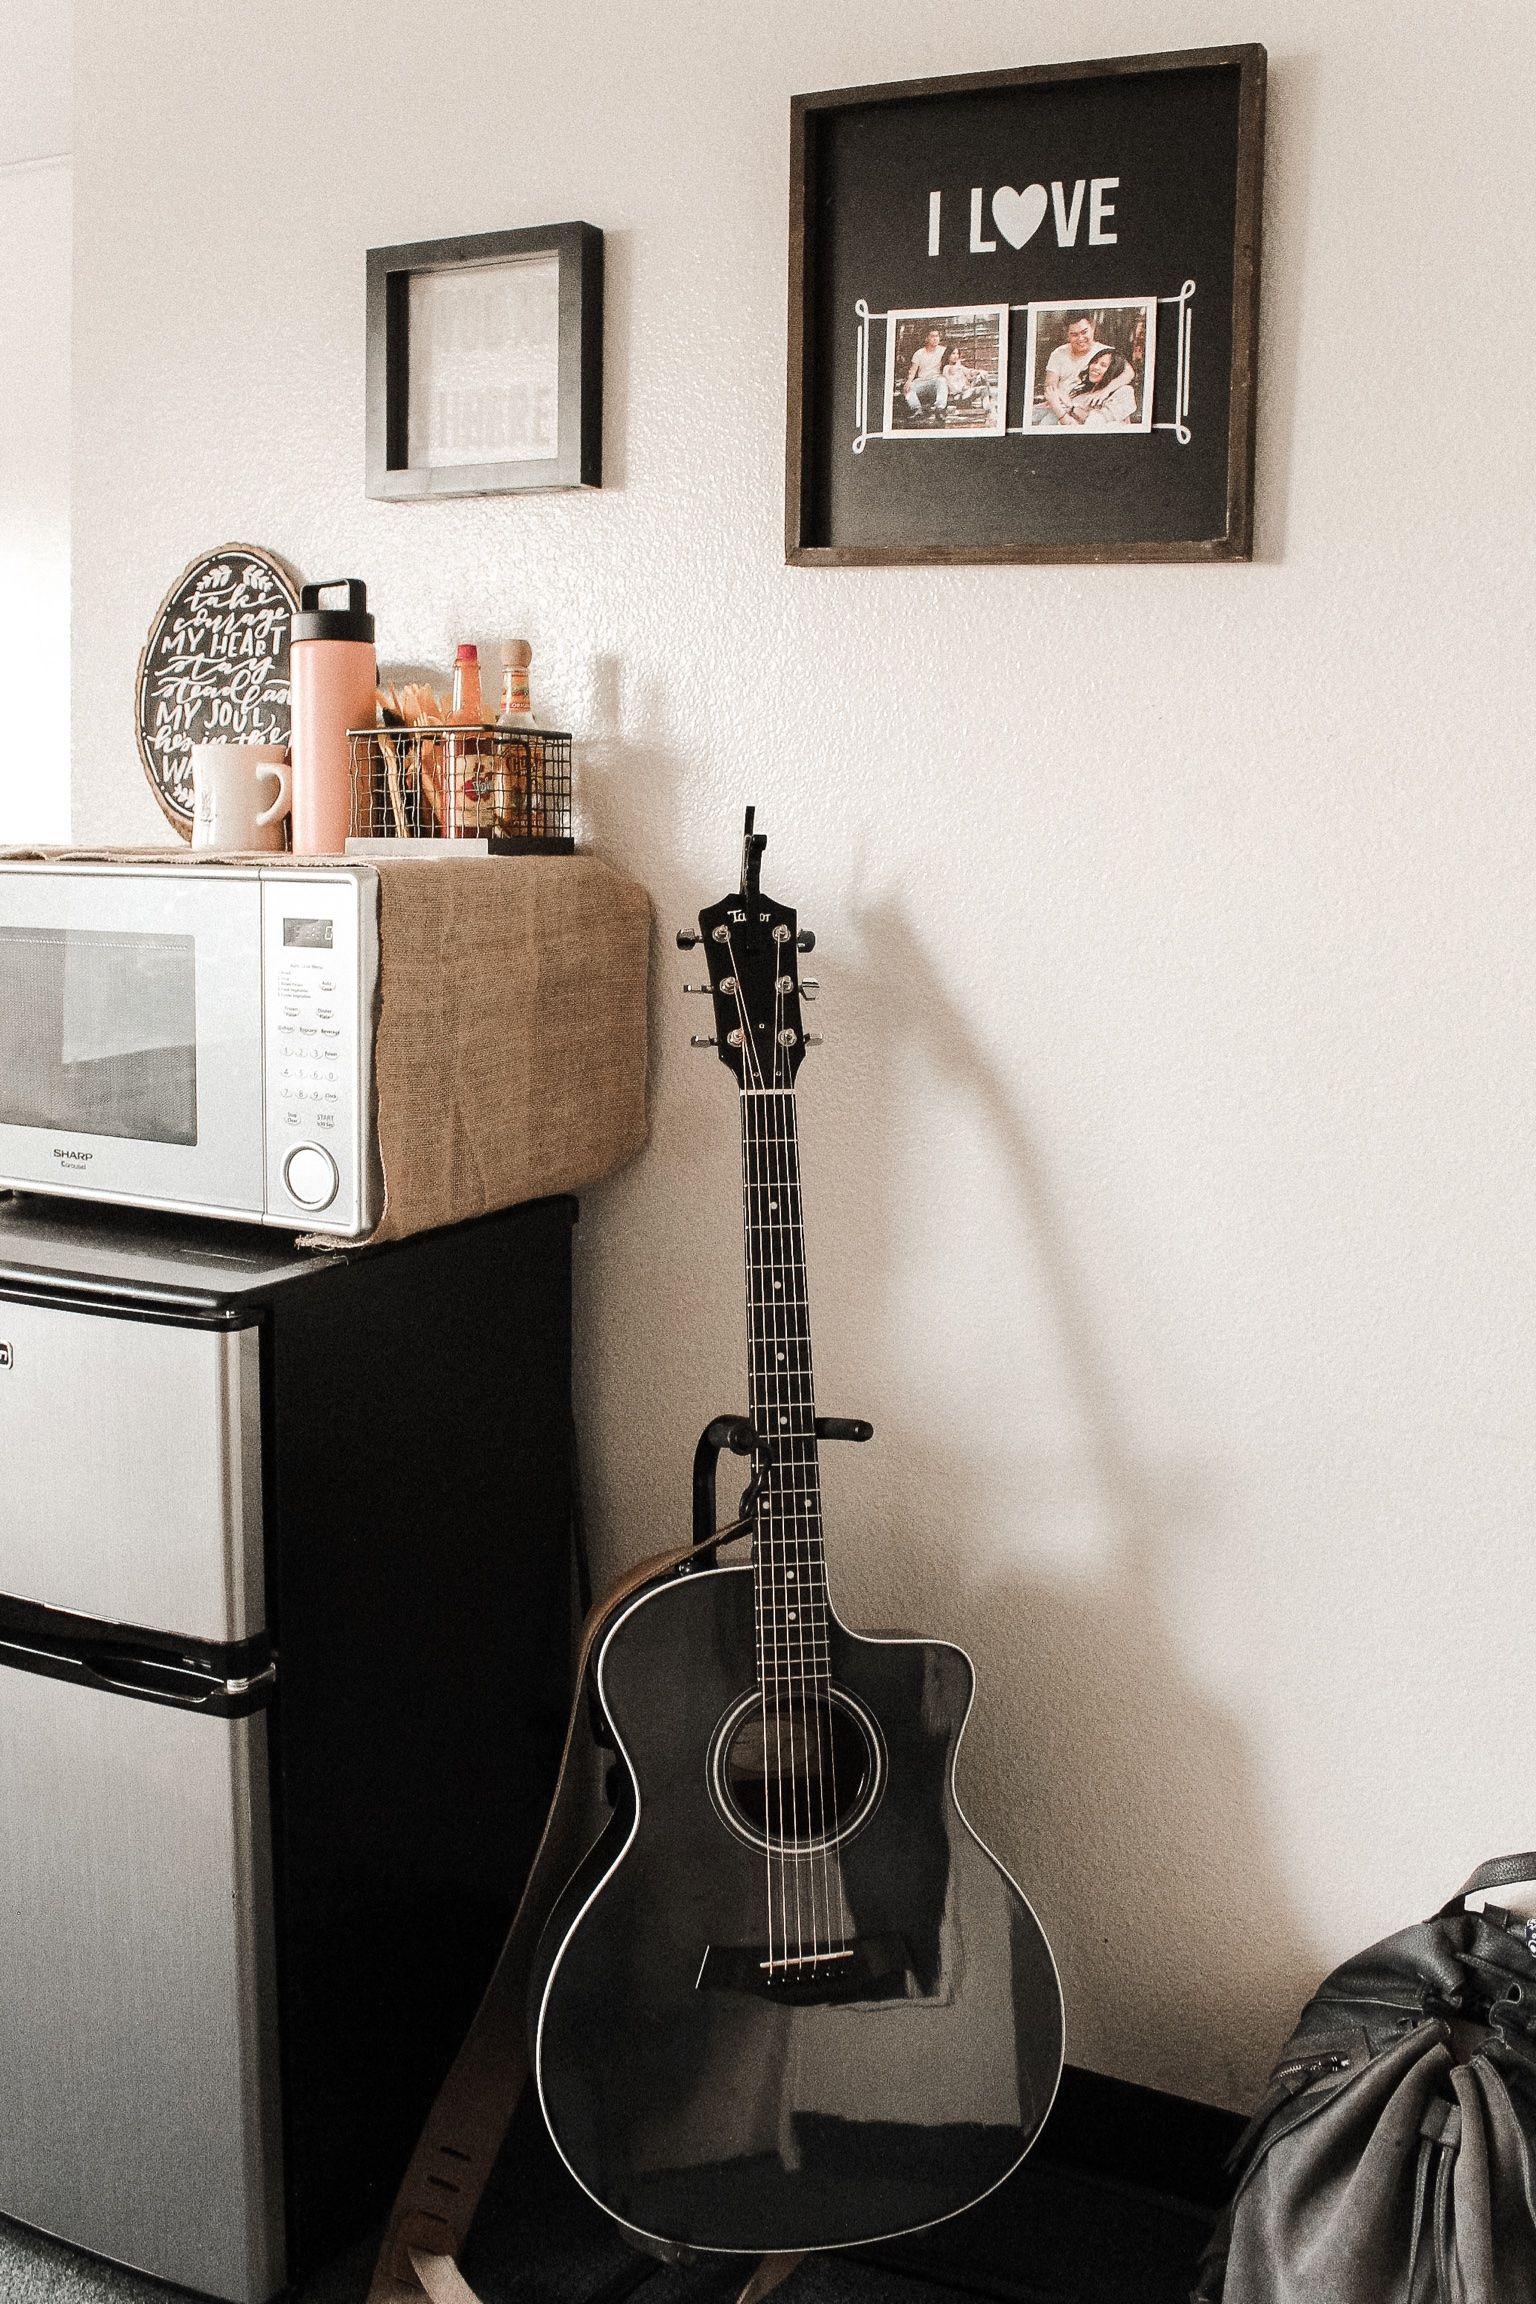 dorm room guitar microwave ig